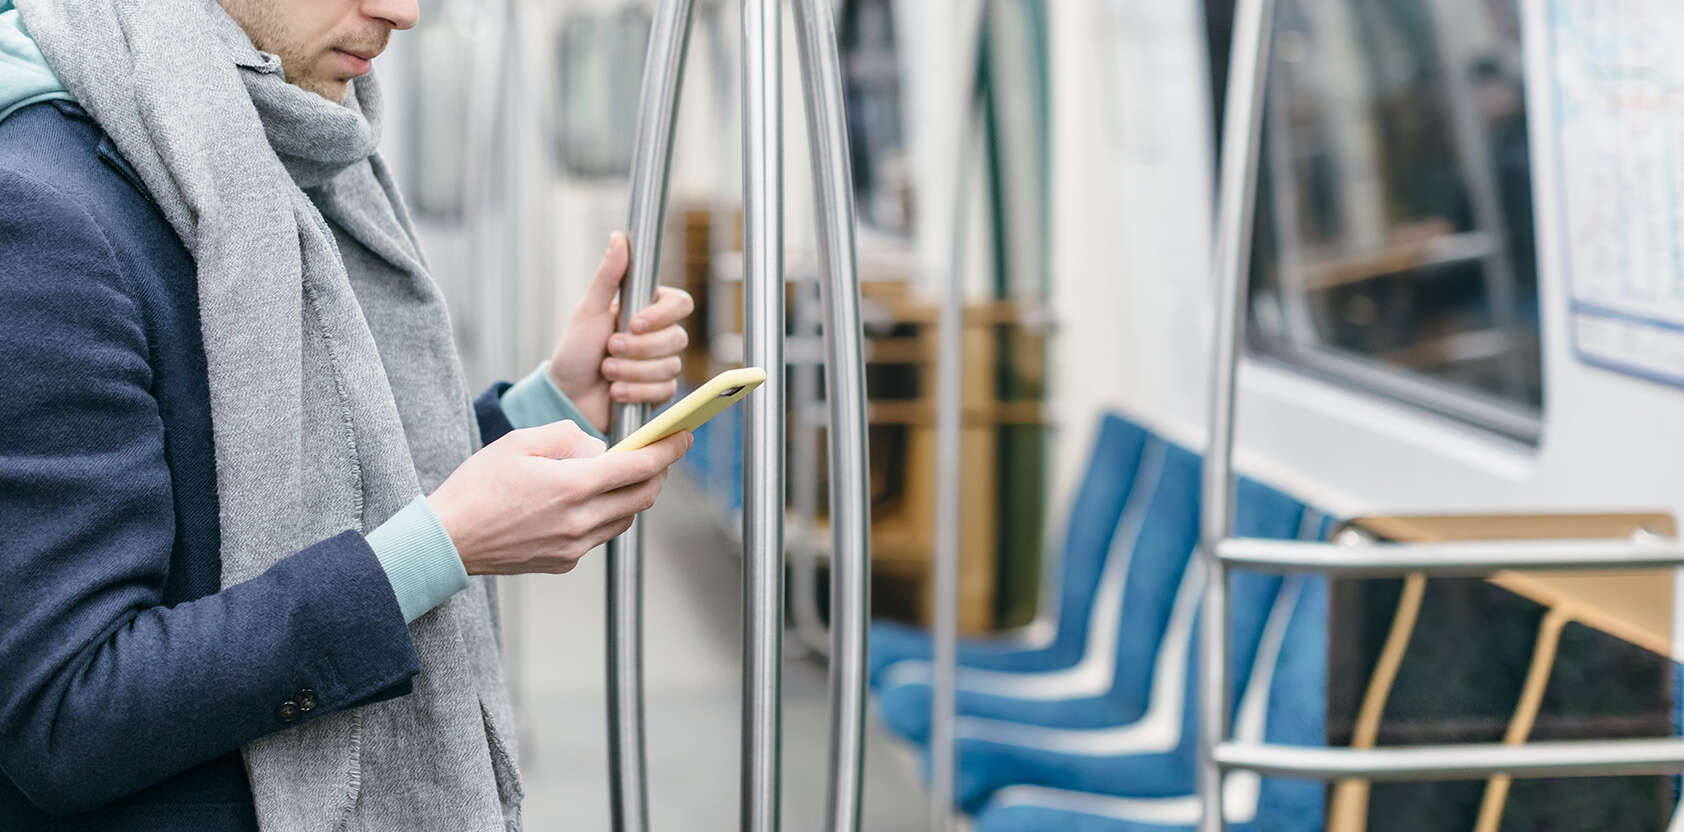 homme-metro-nettoyage